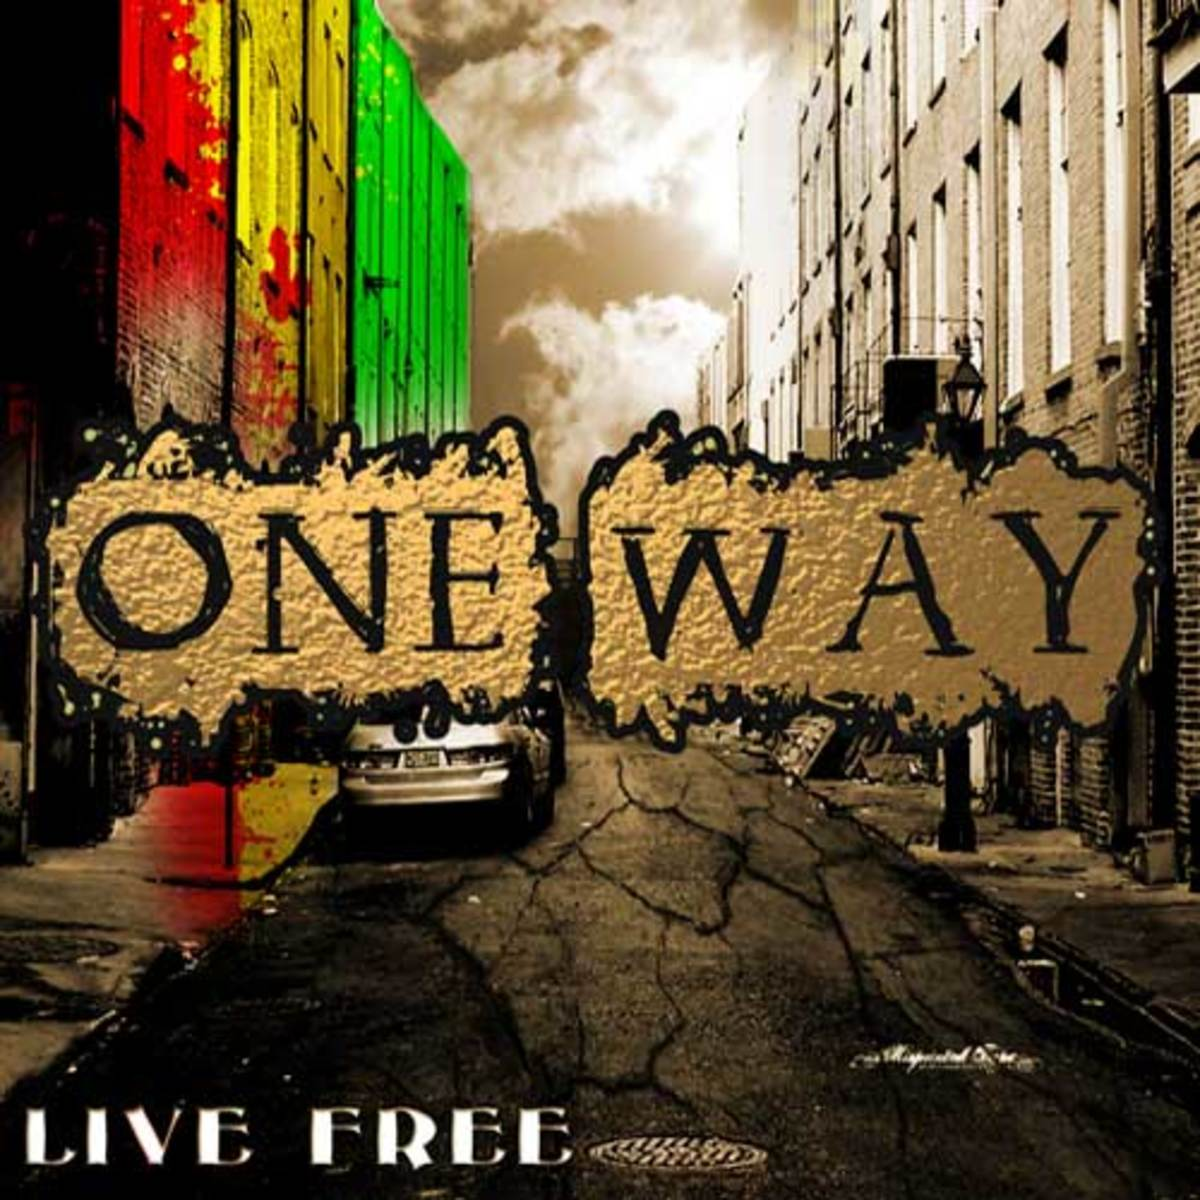 livefree-oneway.jpg